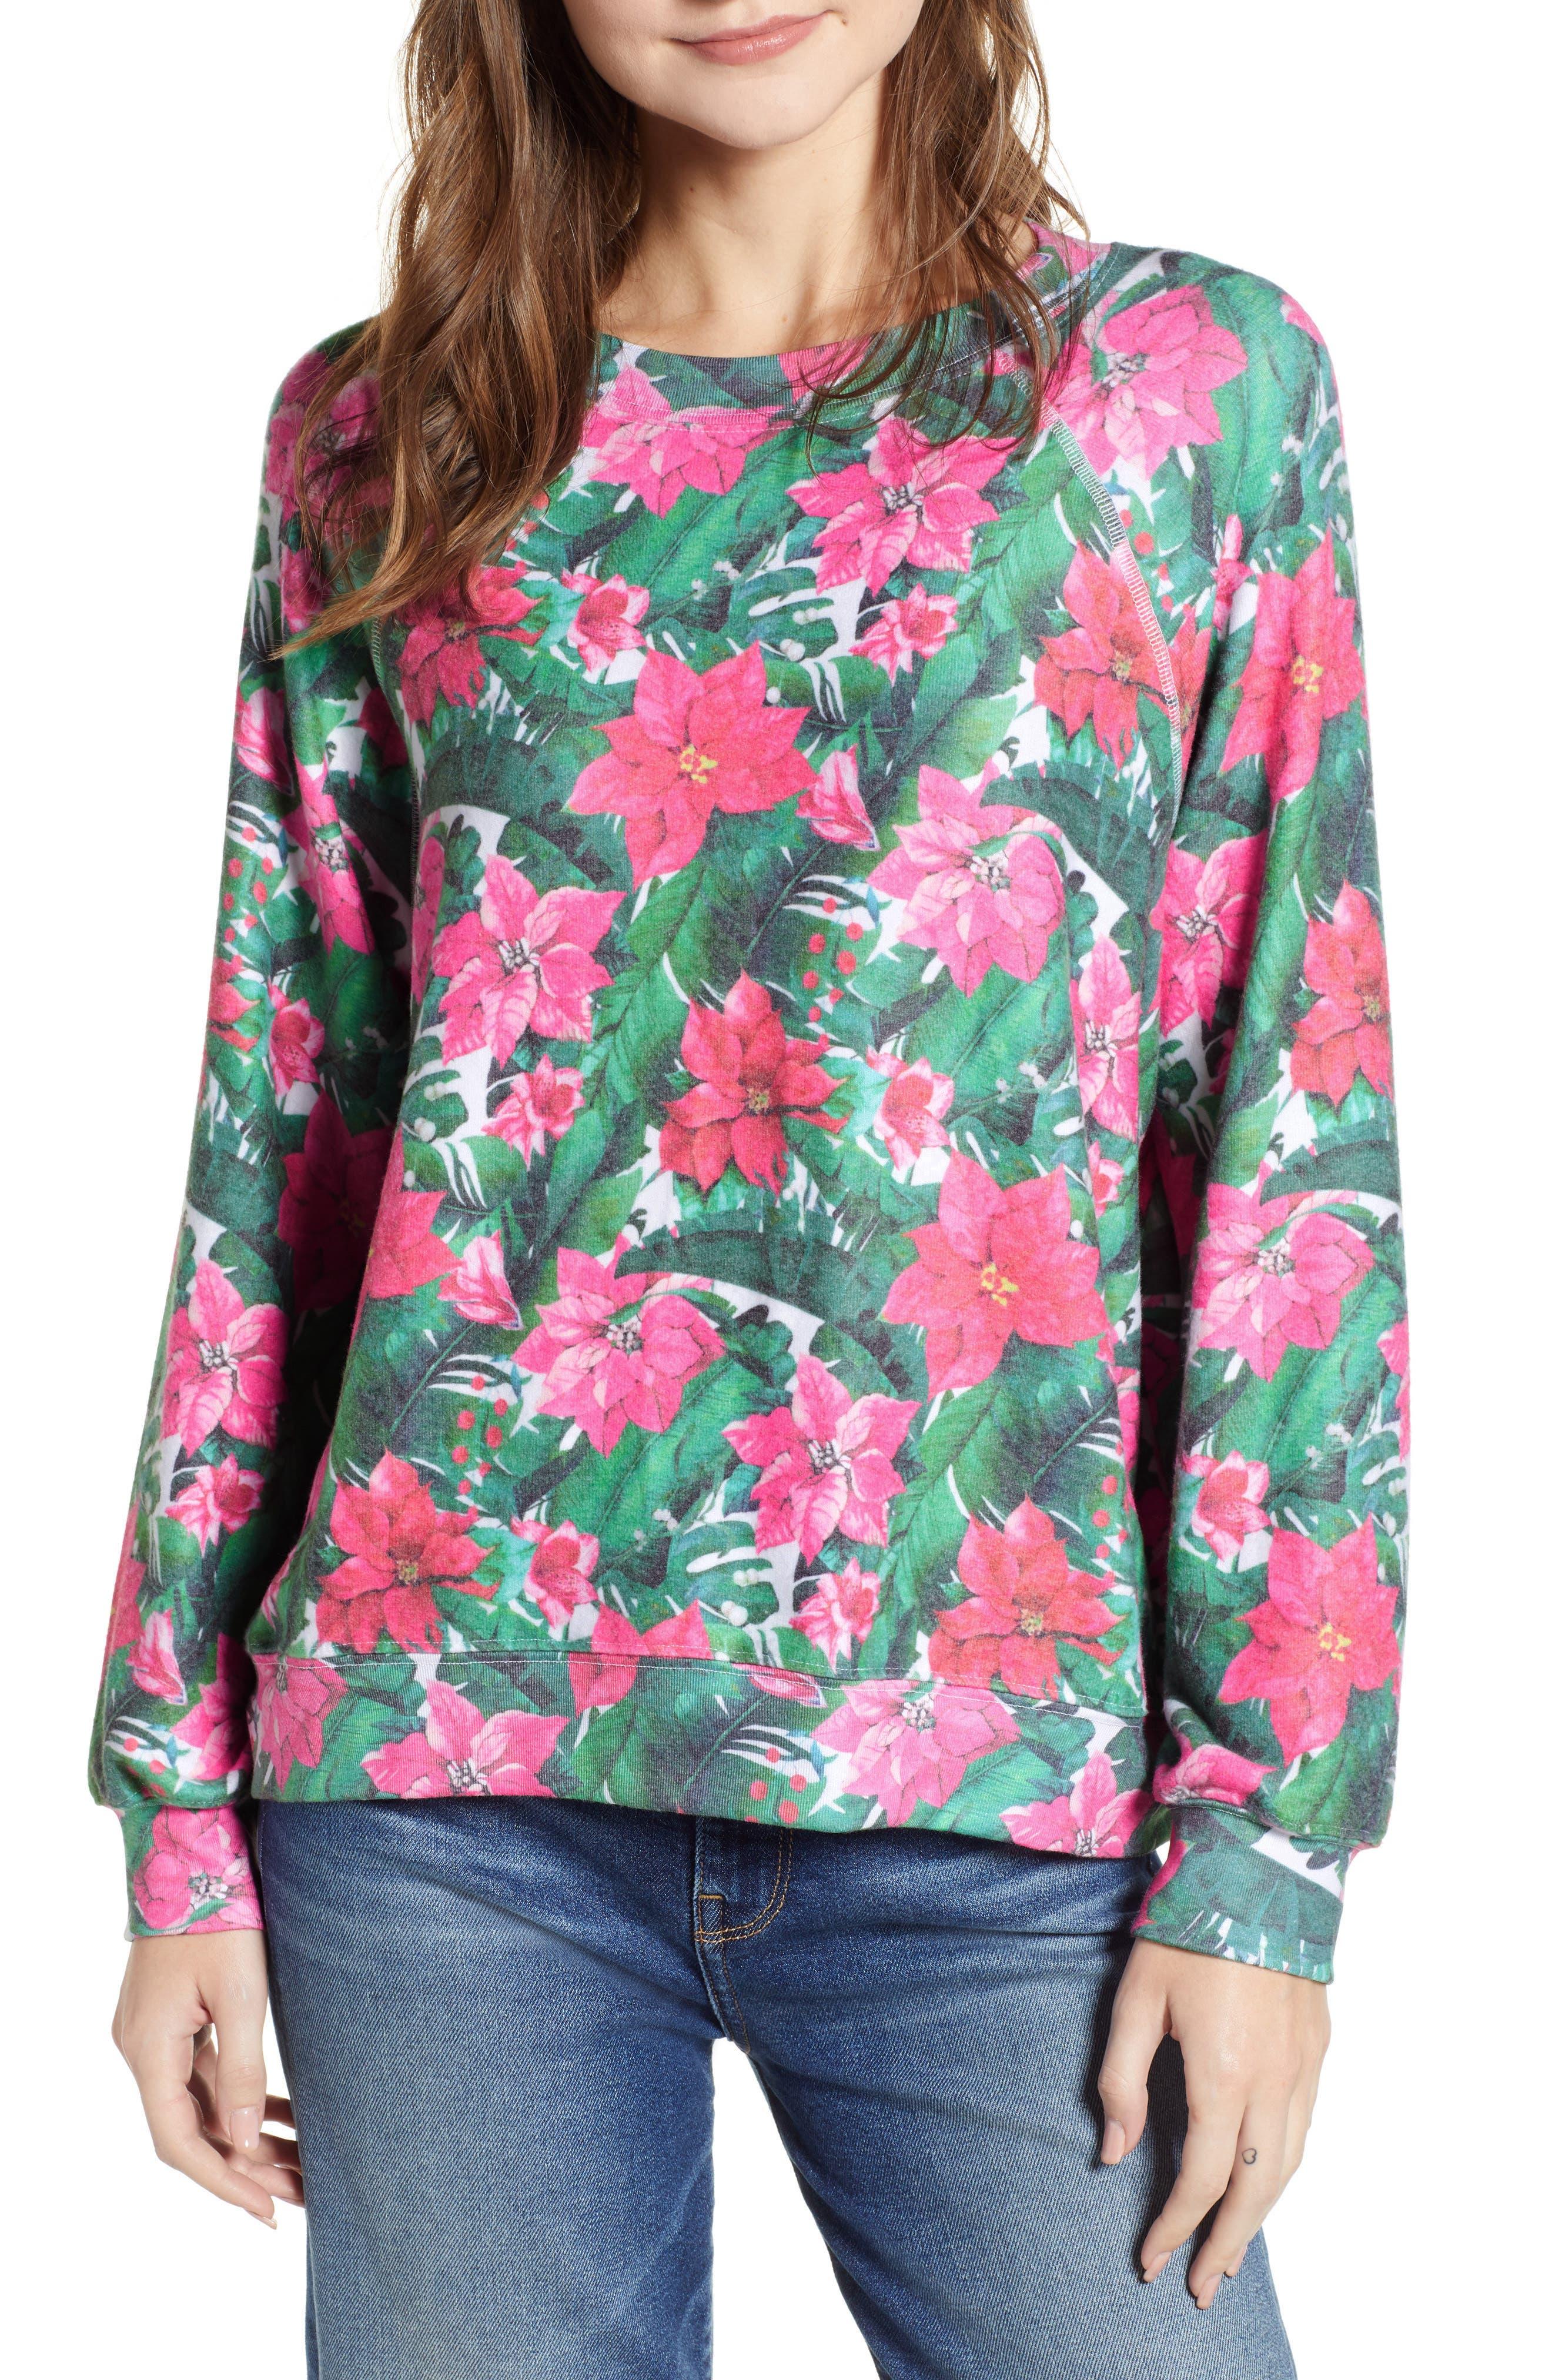 Island Holiday Sommers Sweatshirt,                             Main thumbnail 1, color,                             MULTI